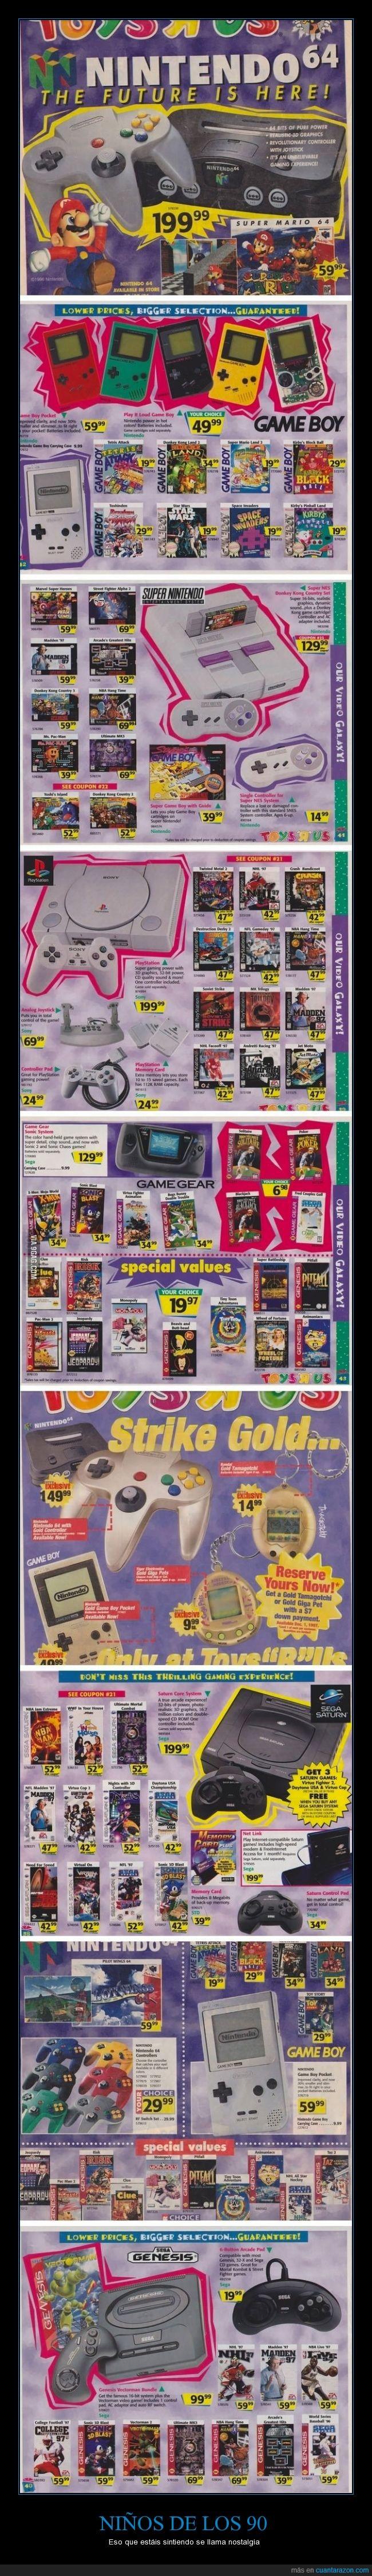 90's,90s,consola,Gameboy,gamegear,genisis,infancia,juego,megadrive,n64,niño,nintendo,noventa,playstation,saturn,sega